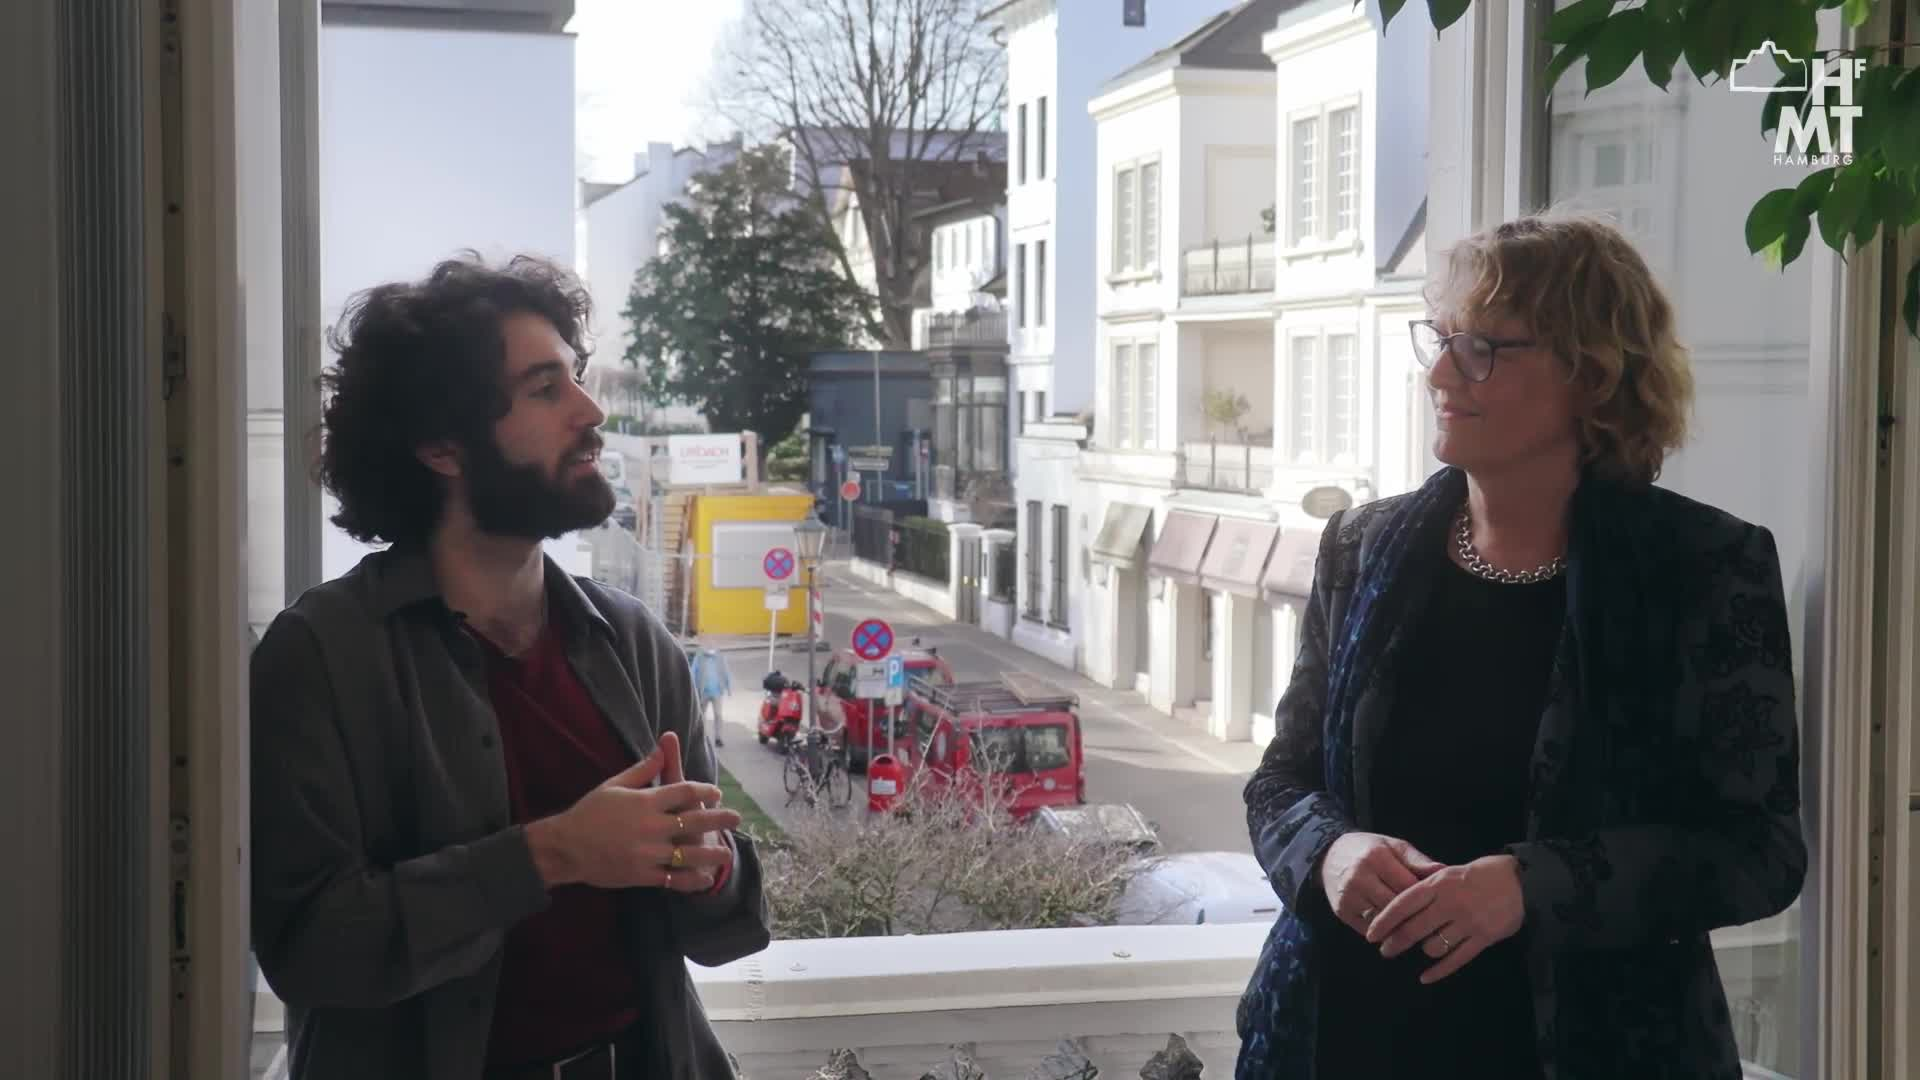 Thumbnail - DAAD Preisträger 2020 - Martín Zamorano